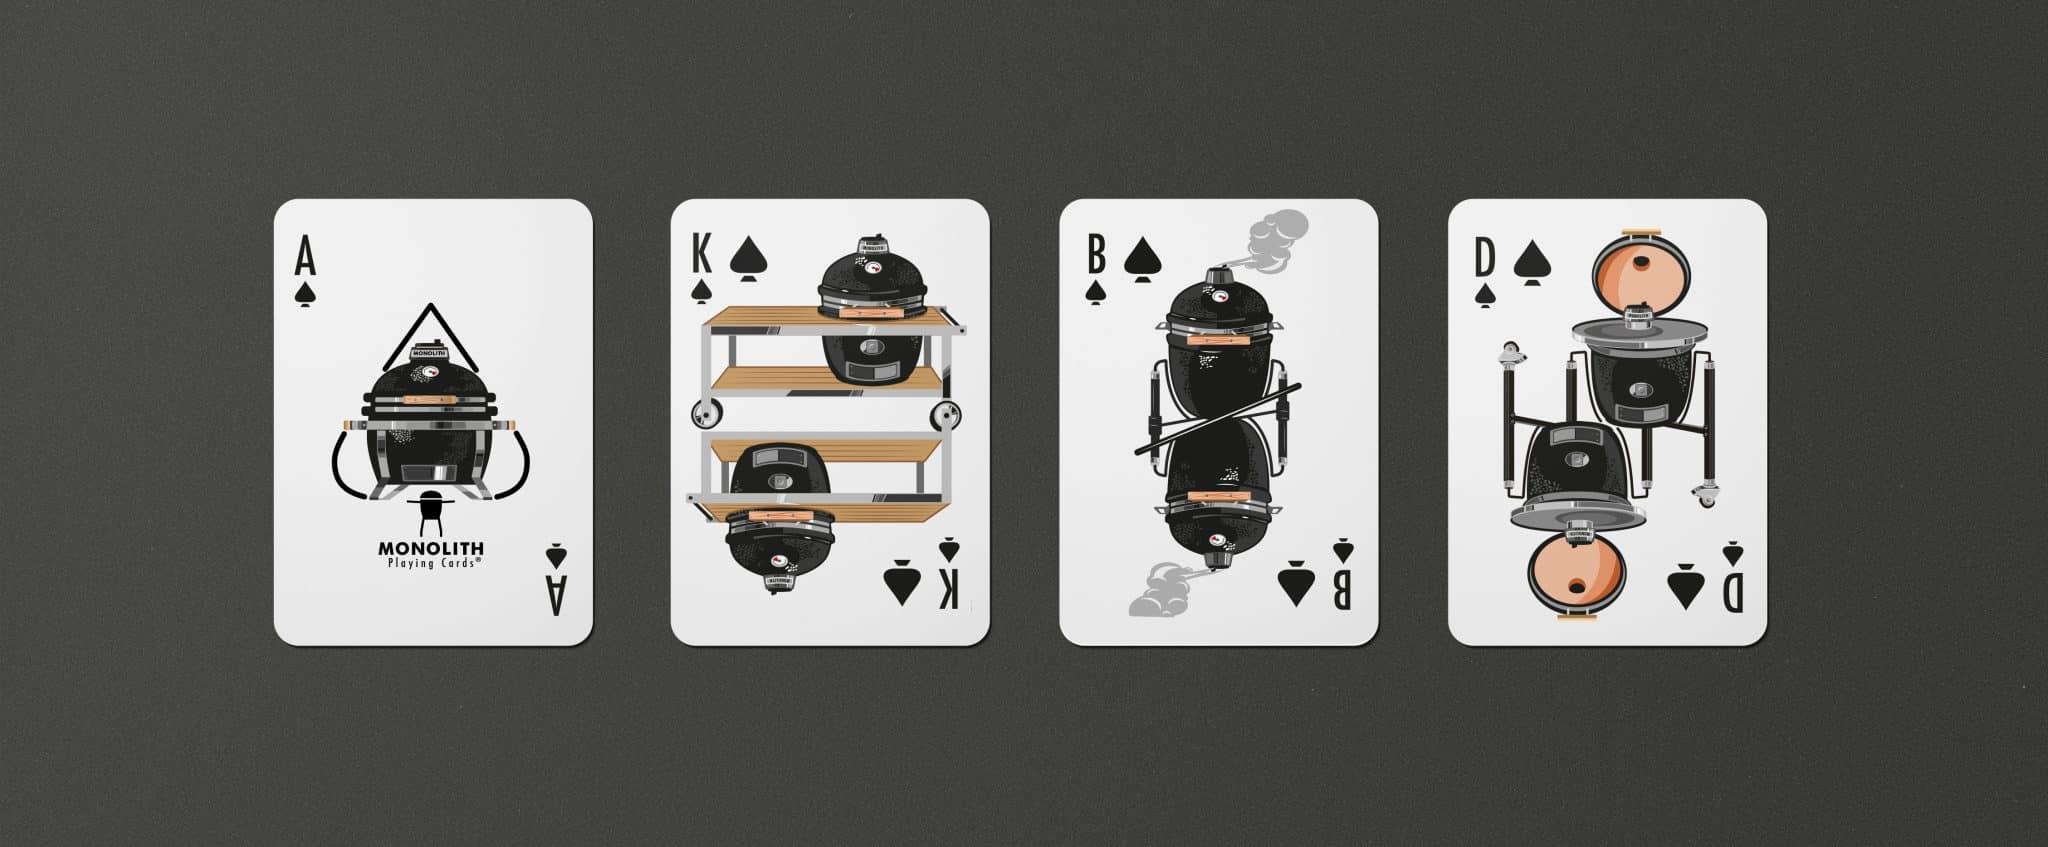 Monolith Kamado Kartenspiel